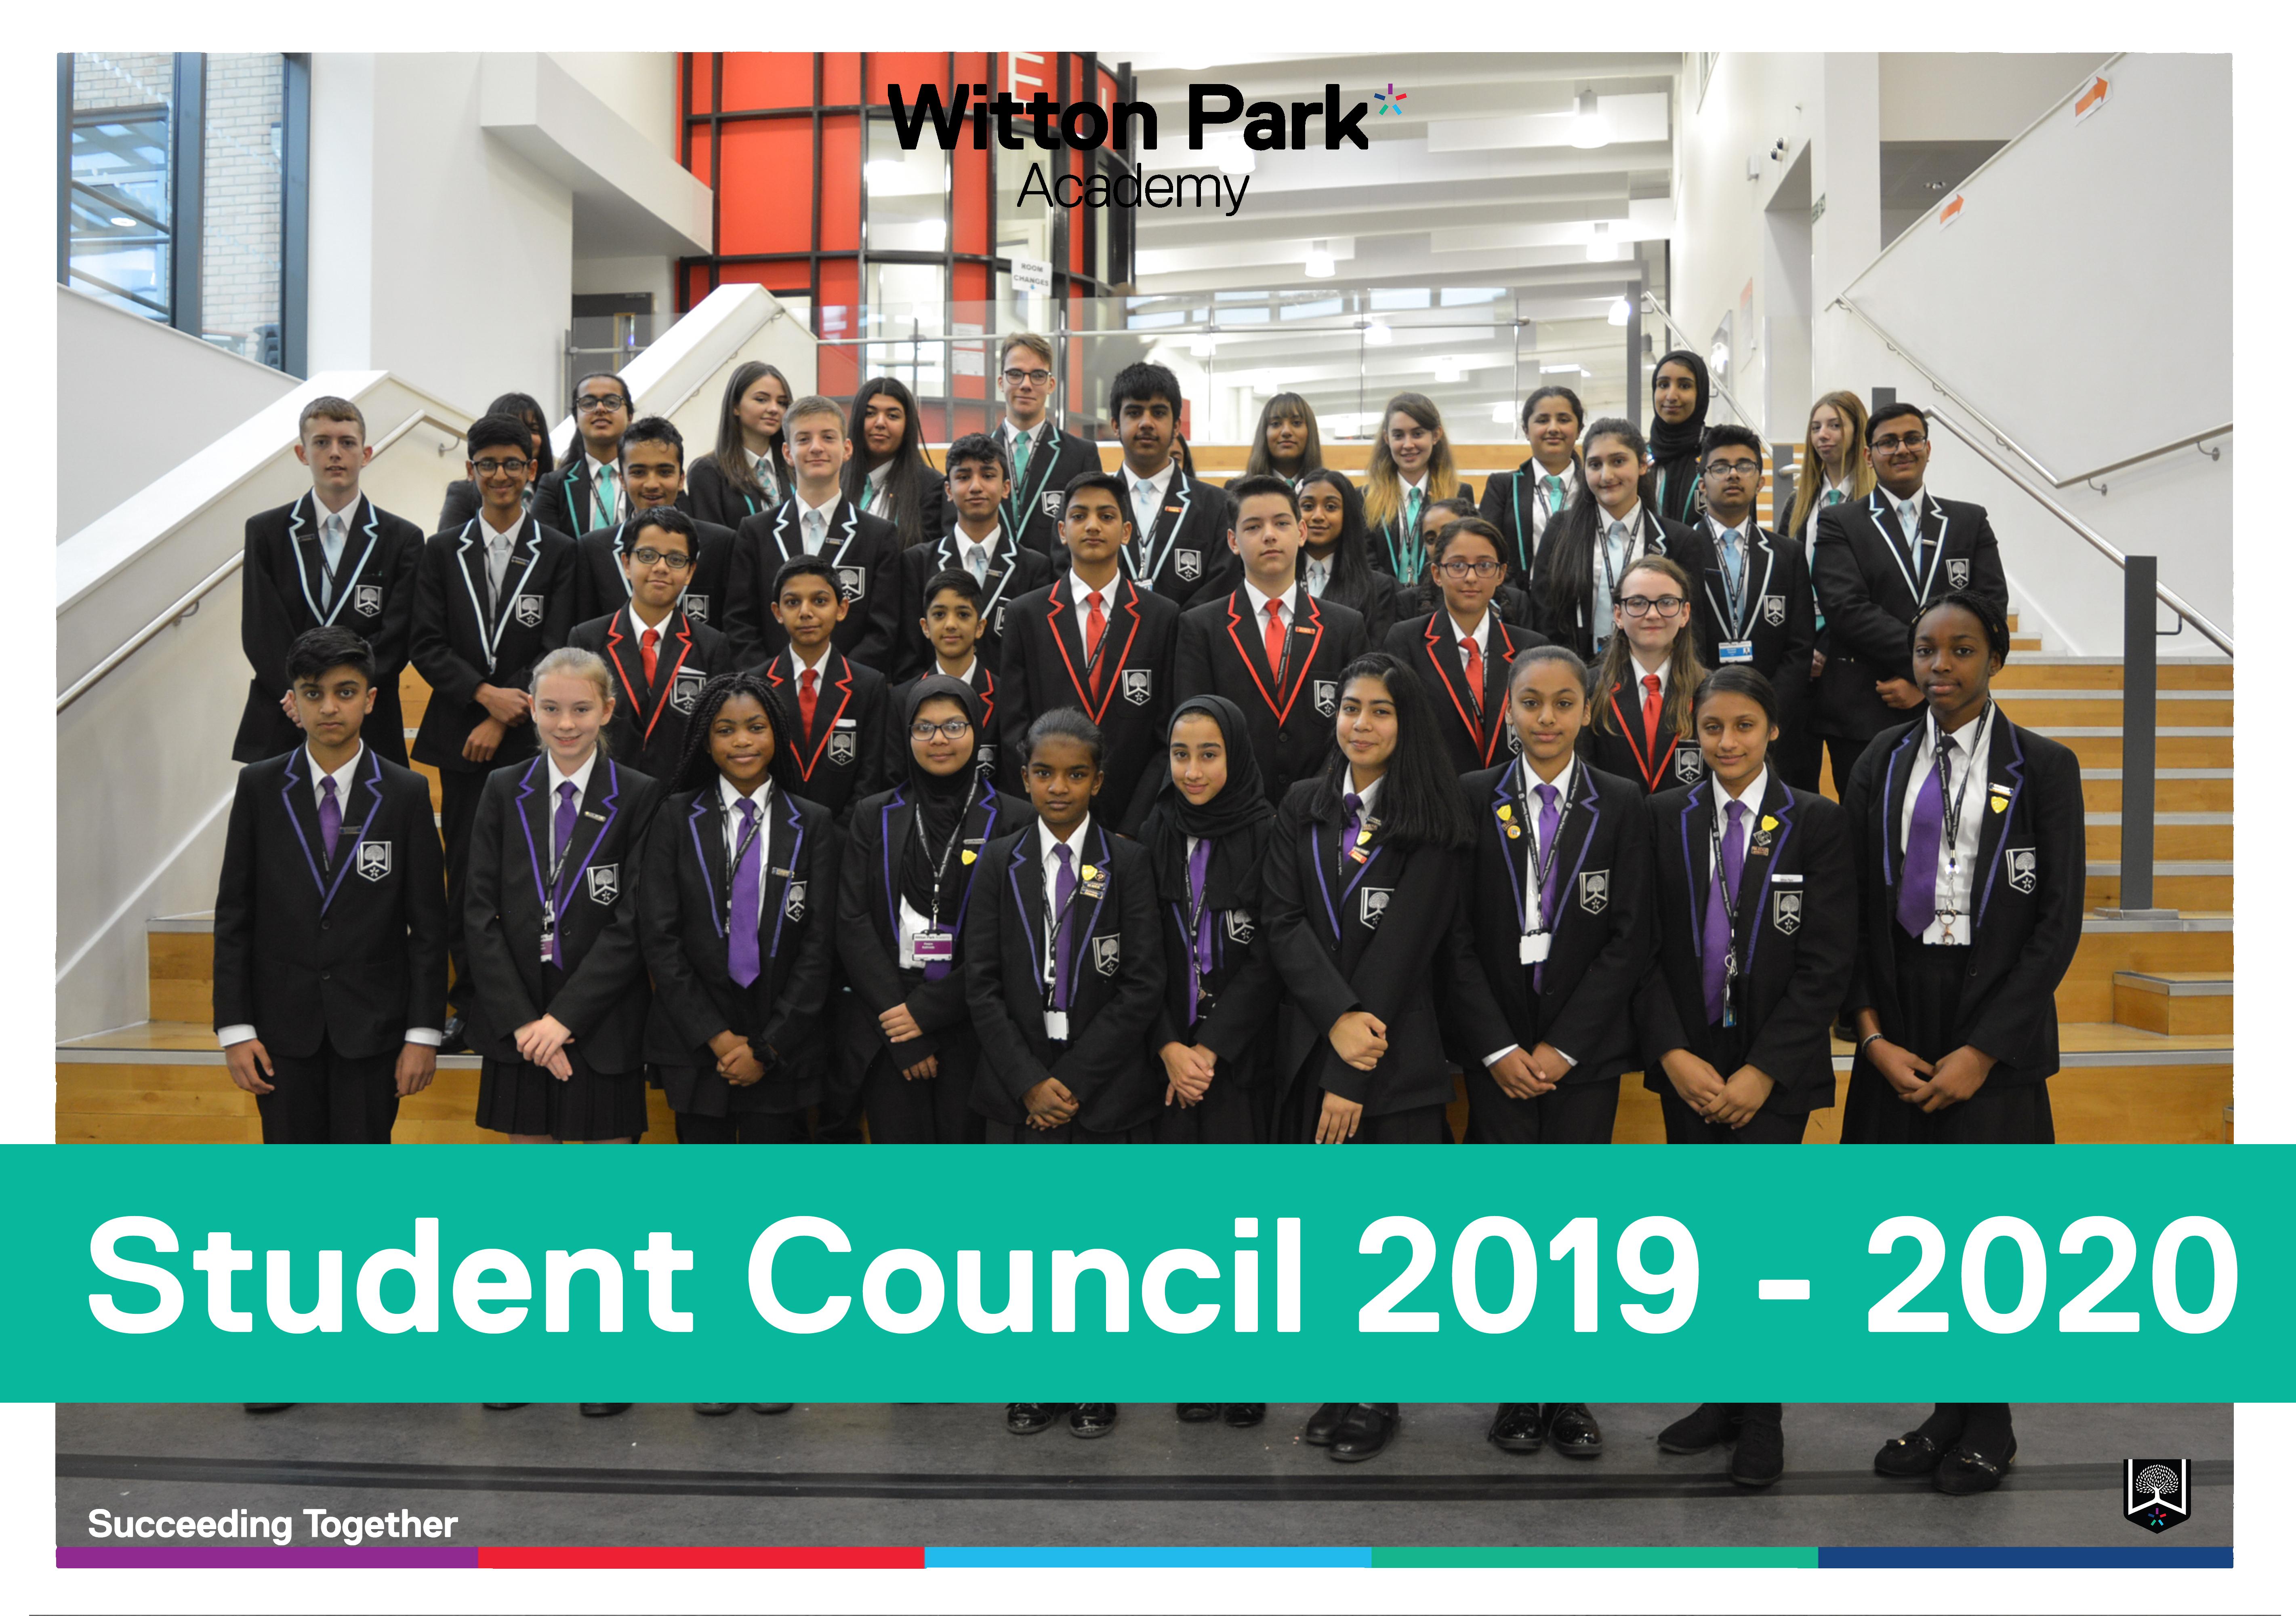 School Council 2019/2020